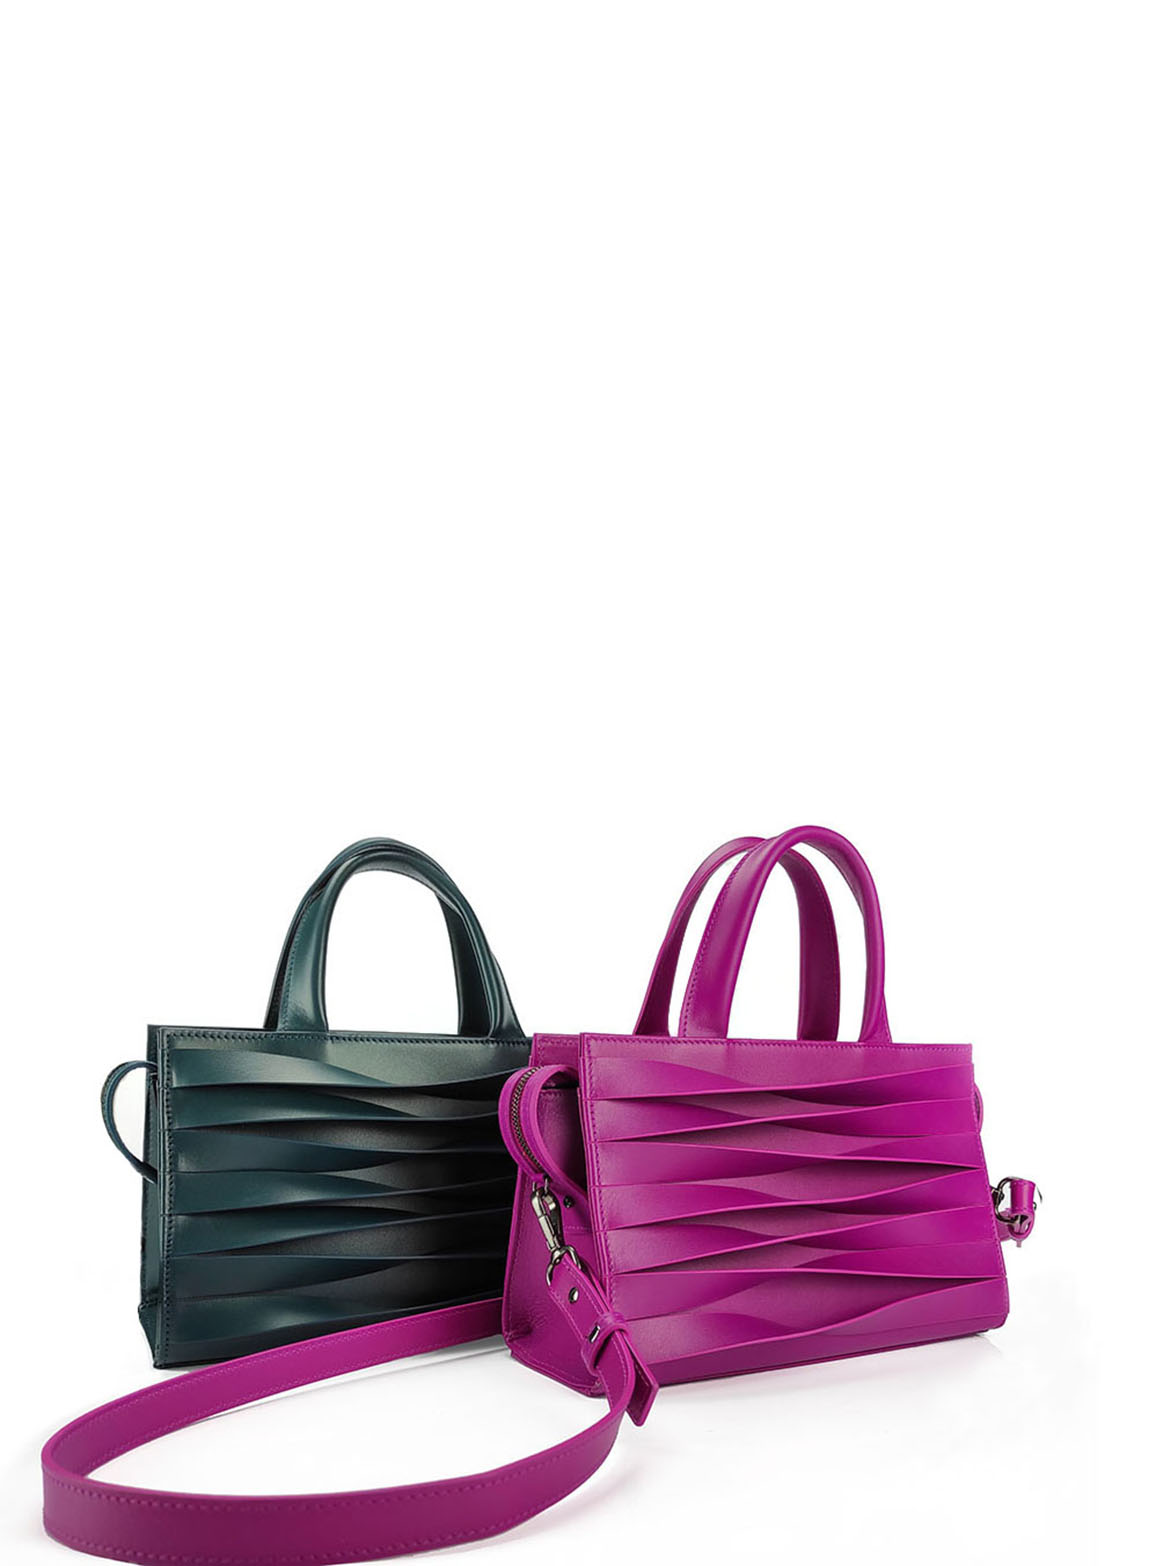 Black city bag